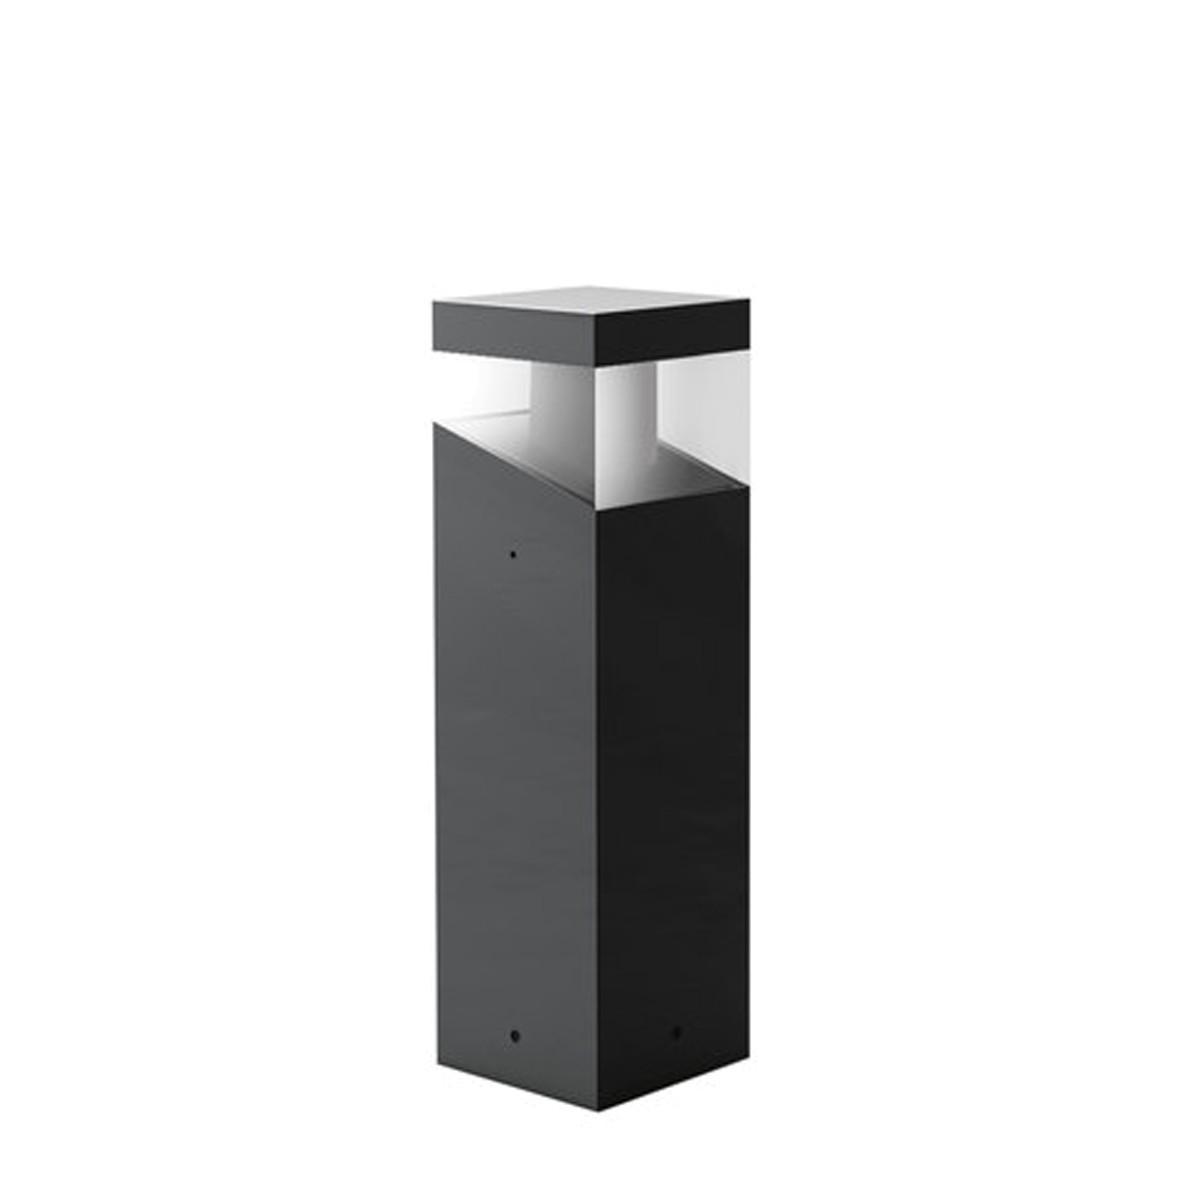 Artemide Outdoor Tetragono Pollerleuchte, Höhe: 45 cm, anthrazitgrau